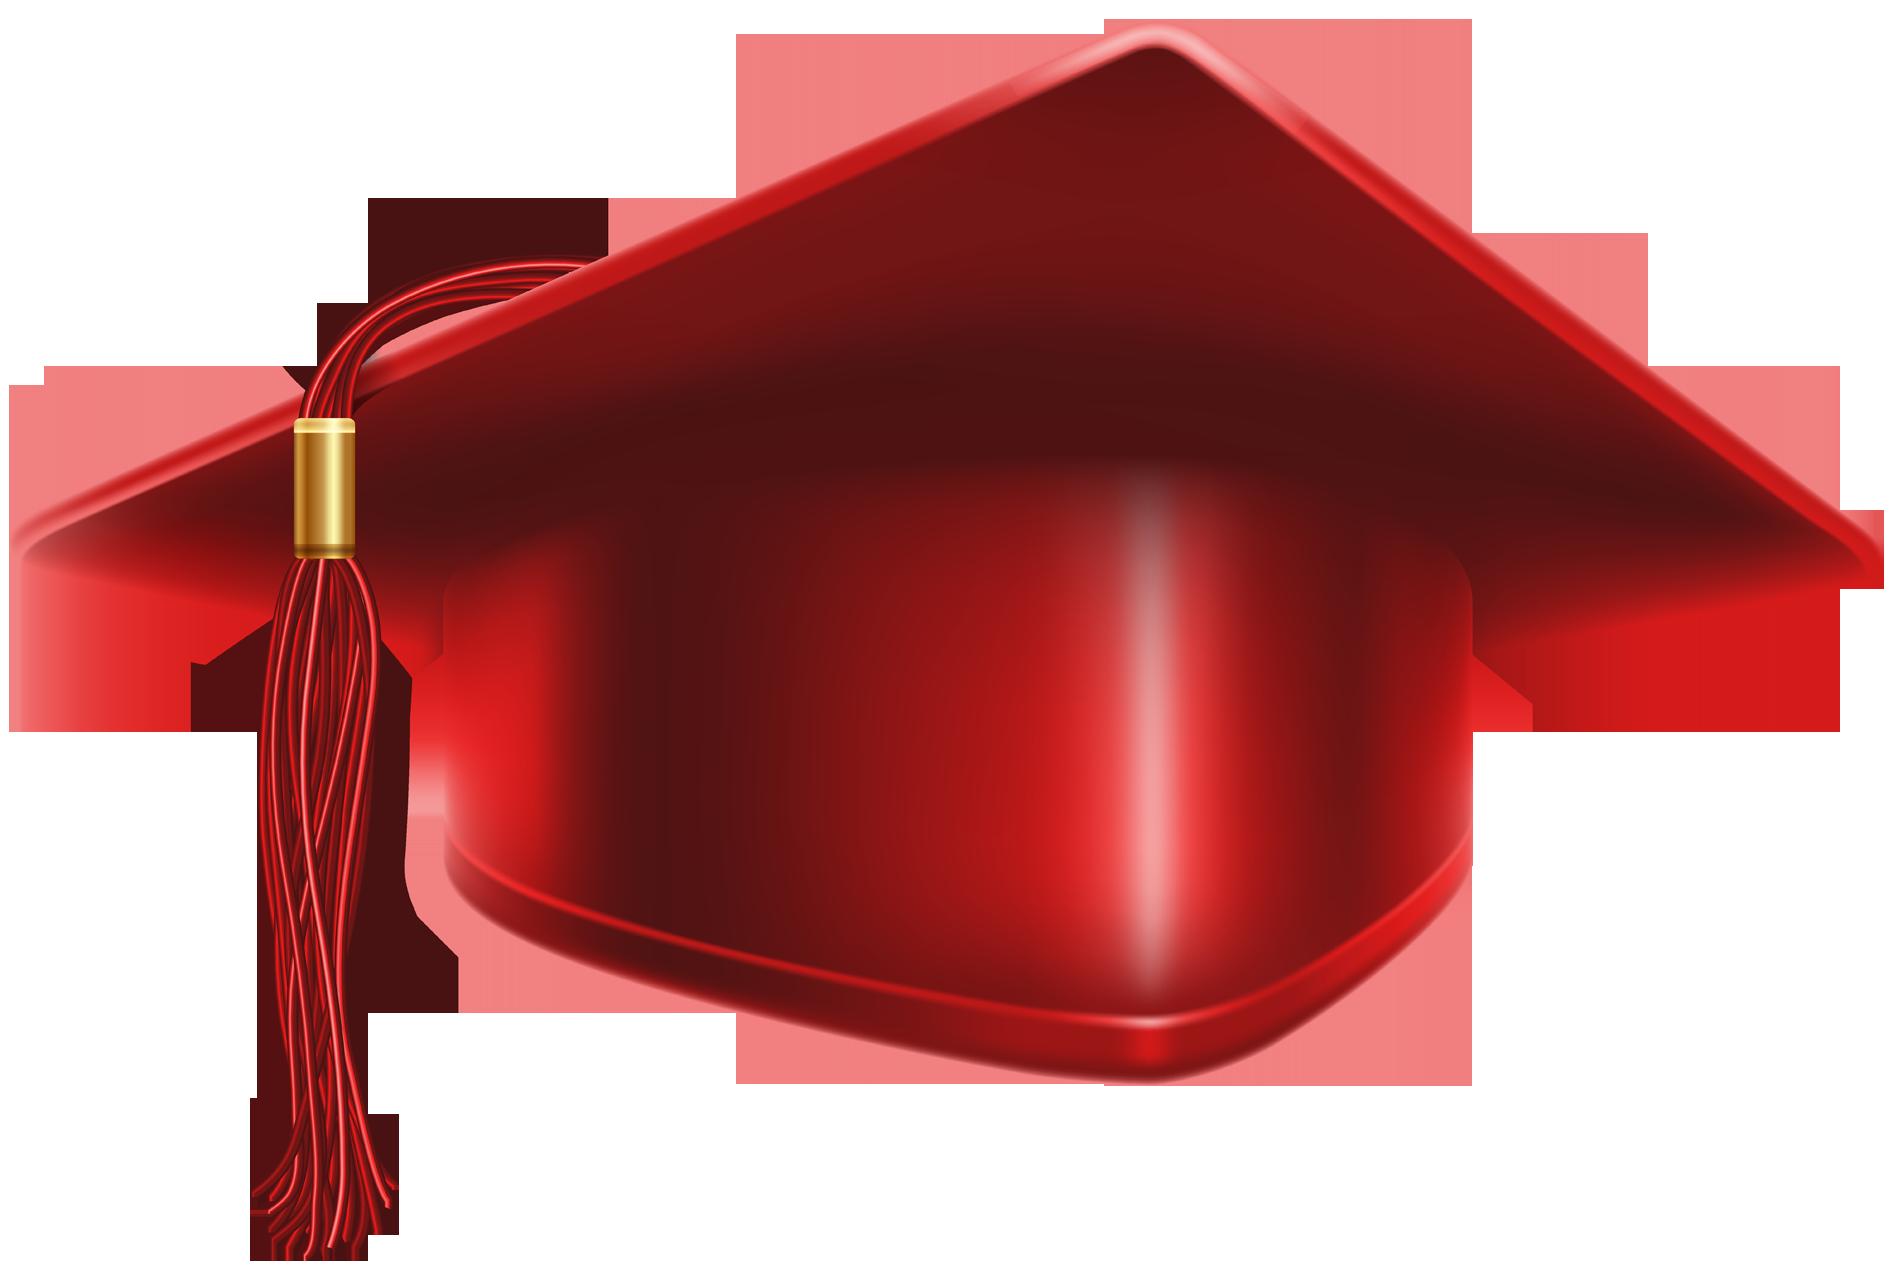 Cap and diploma png. Graduation clipart maroon